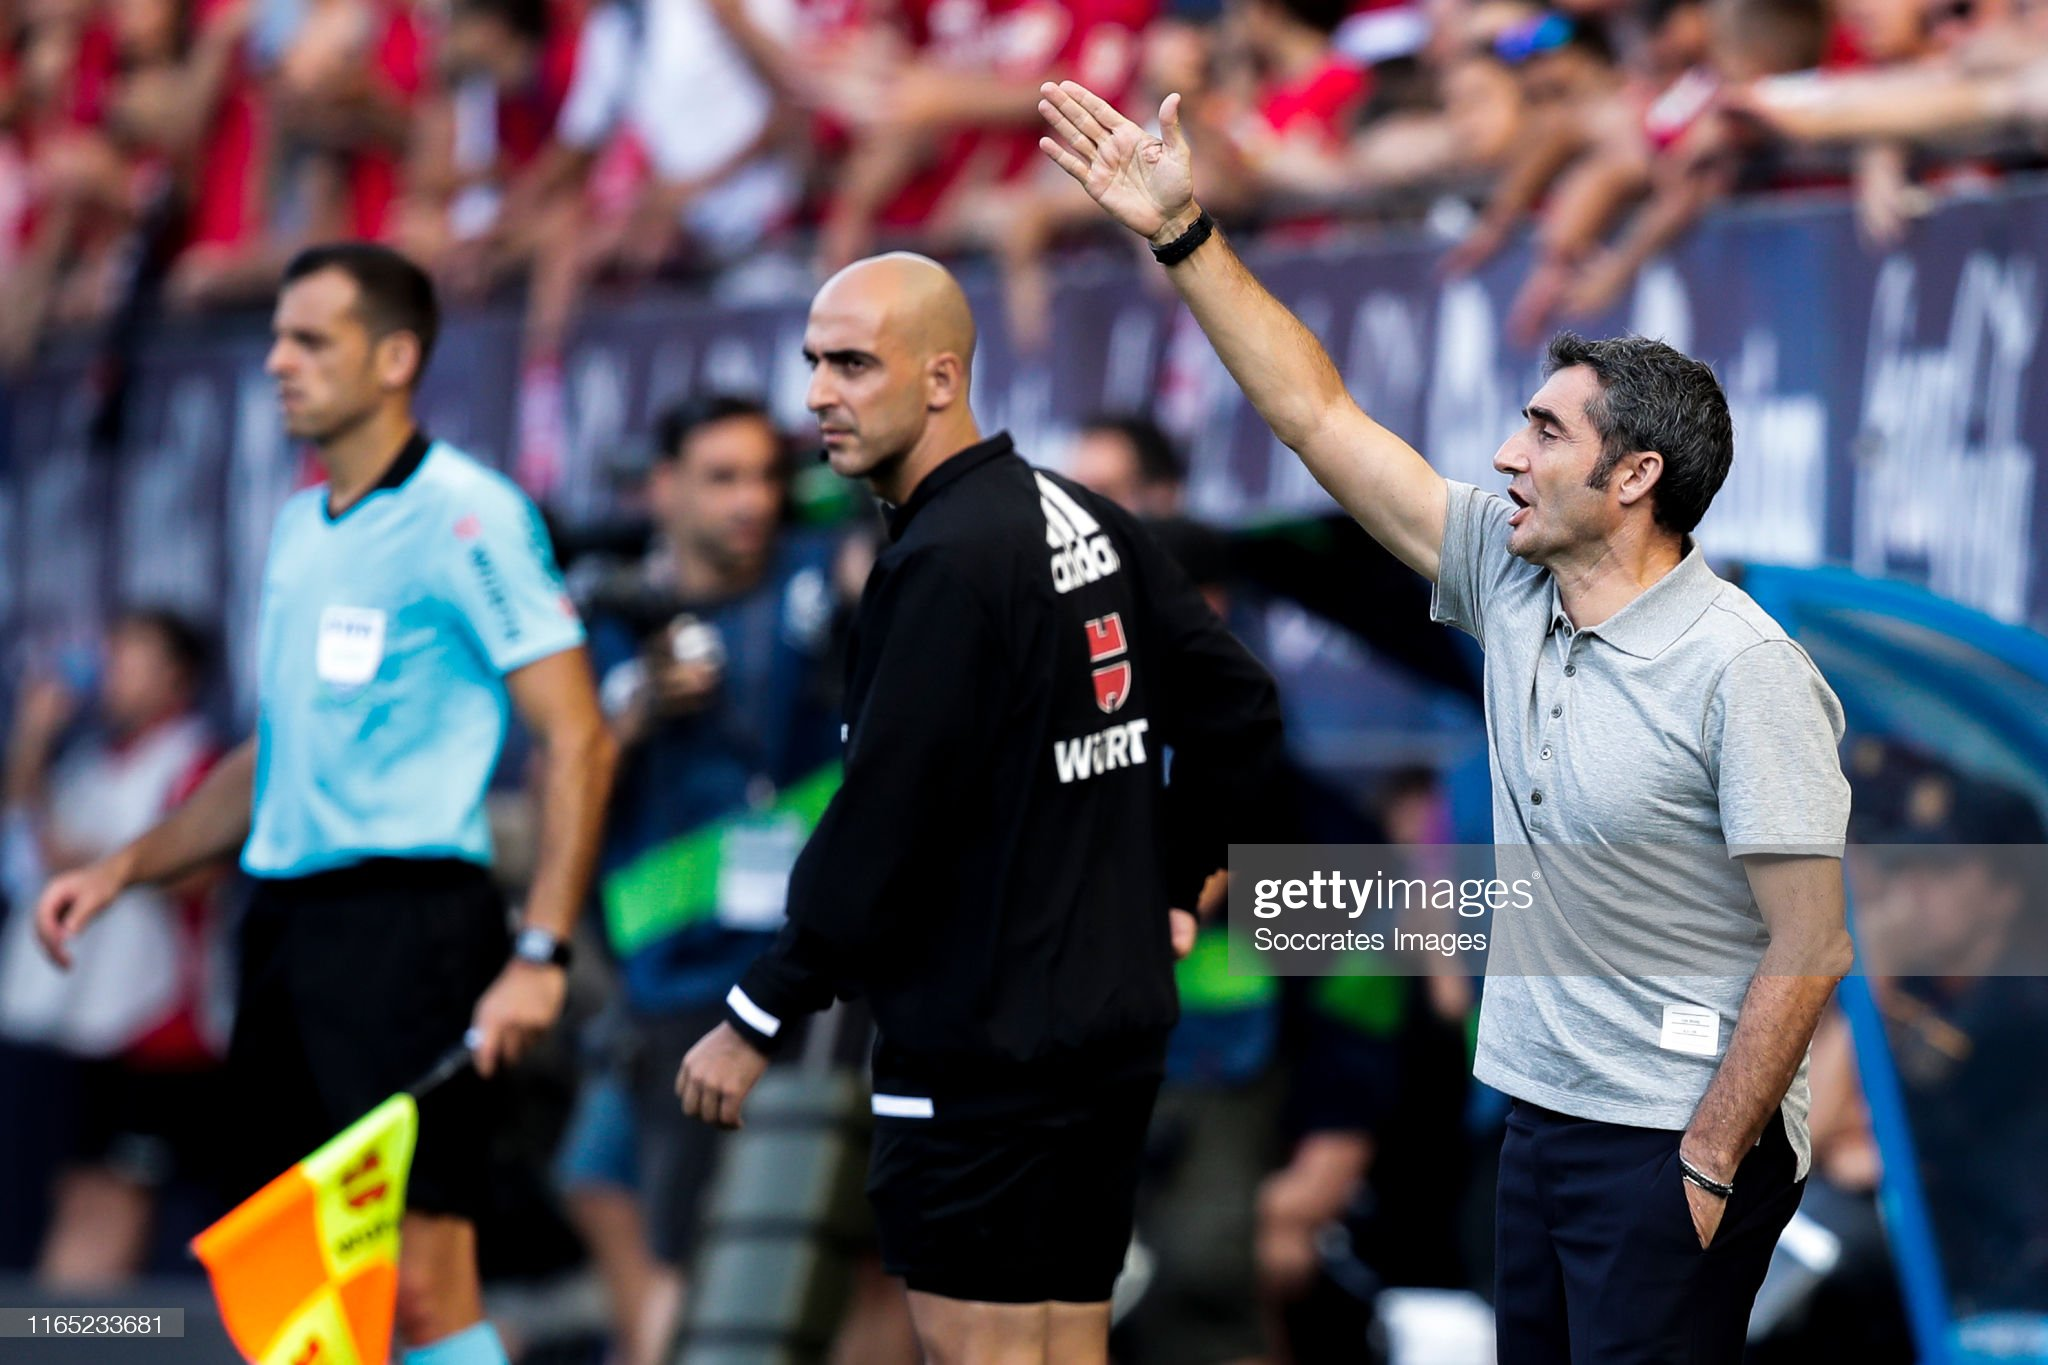 صور مباراة : أوساسونا - برشلونة 2-2 ( 31-08-2019 )  Coach-ernesto-valverde-of-fc-barcelona-during-the-la-liga-santander-picture-id1165233681?s=2048x2048